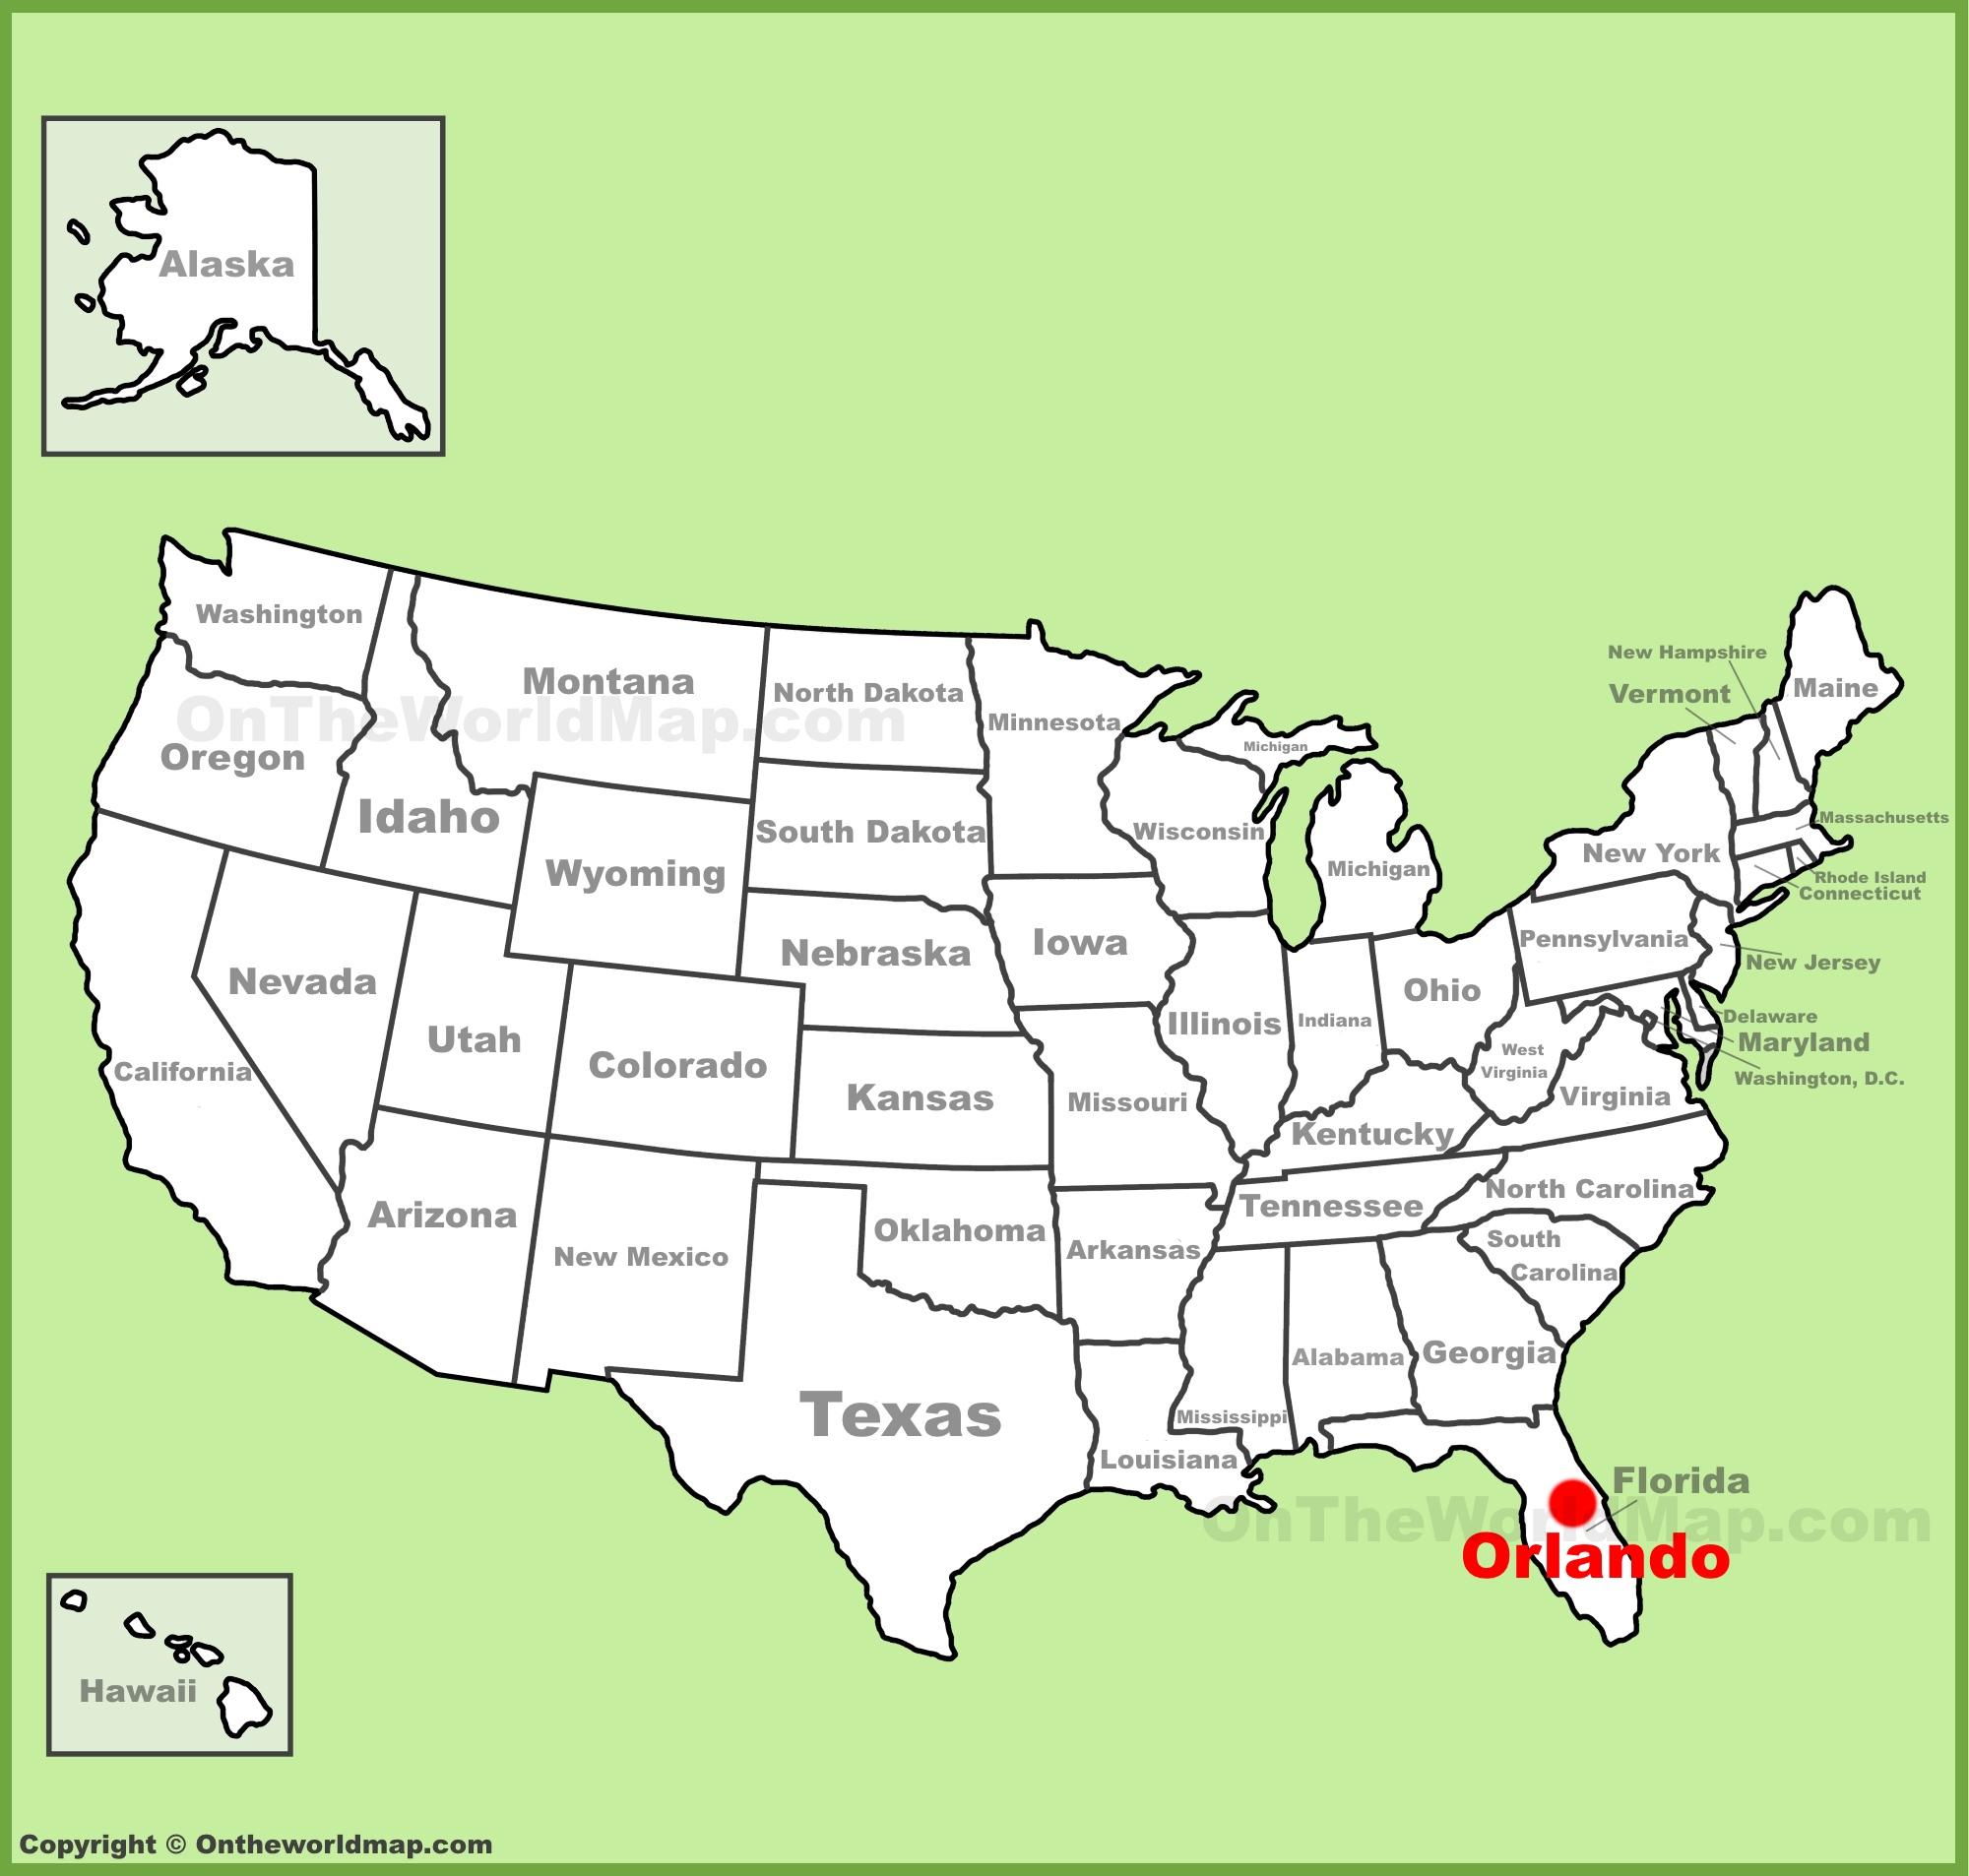 Orlando Maps   Florida, U.s.   Maps Of Orlando - Orlando Florida Location On Map